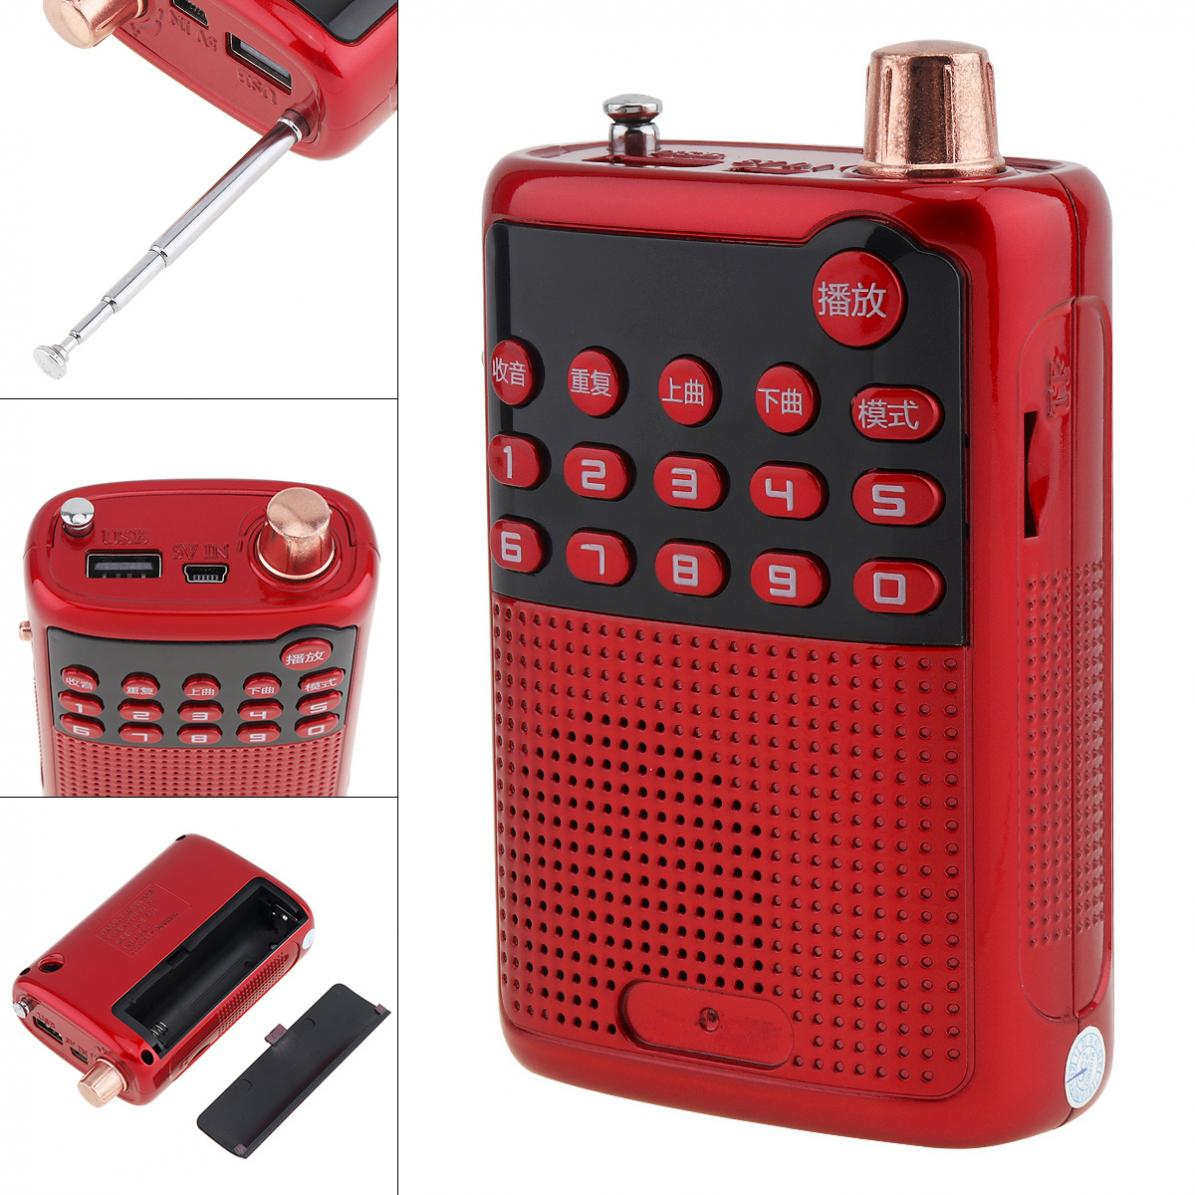 E55 Portable Radio Mini Audio Card Speaker FM Radio with 3.5mm Headphone Jack for Outdoor / Home